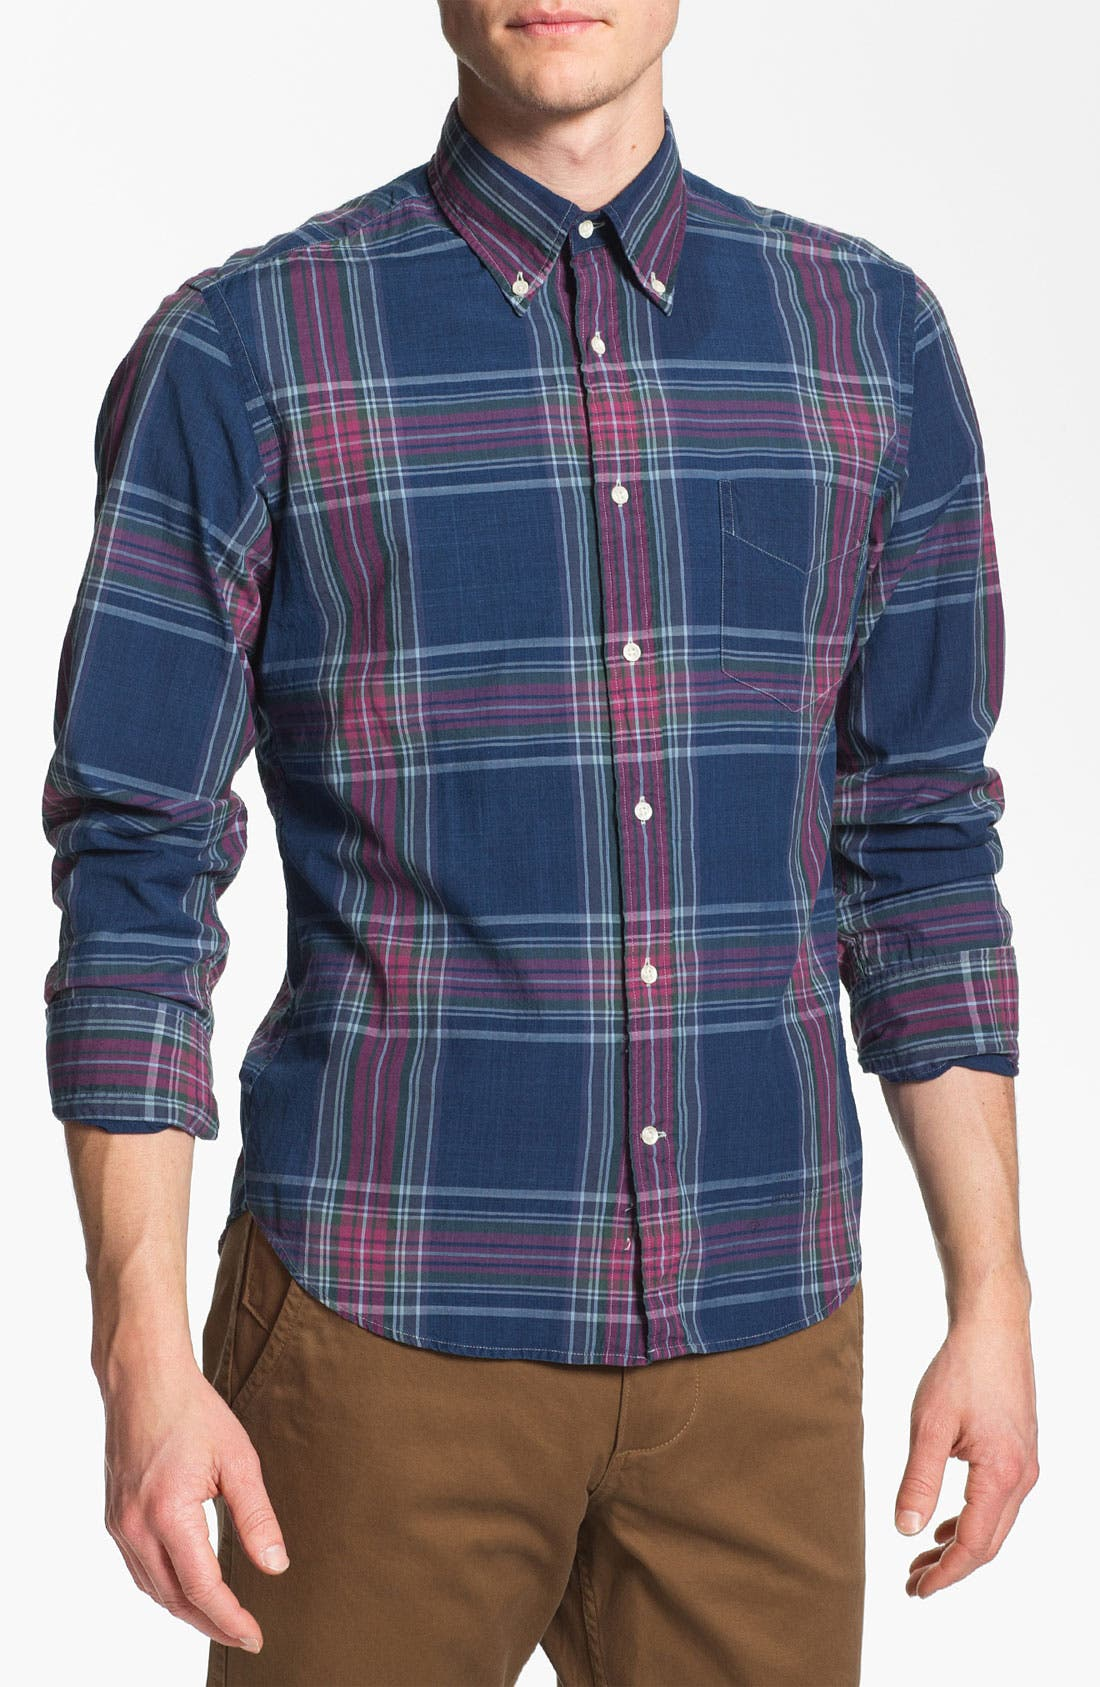 Main Image - Gant Rugger Madras Plaid Woven Shirt